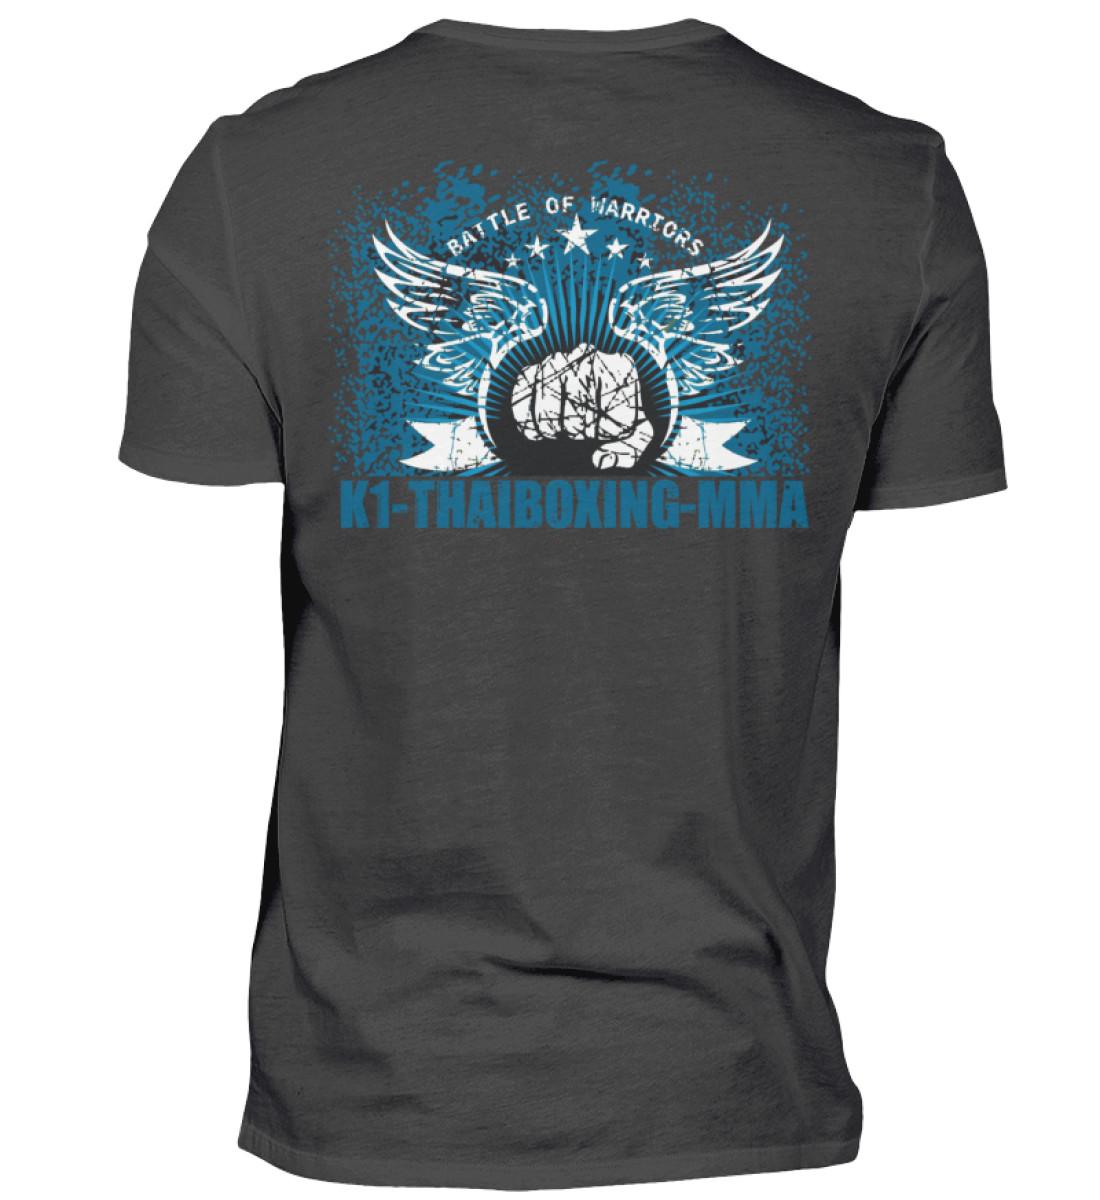 COMA Team K1, Thaiboxing-MMA T-Shirt - Herren Premiumshirt-2989